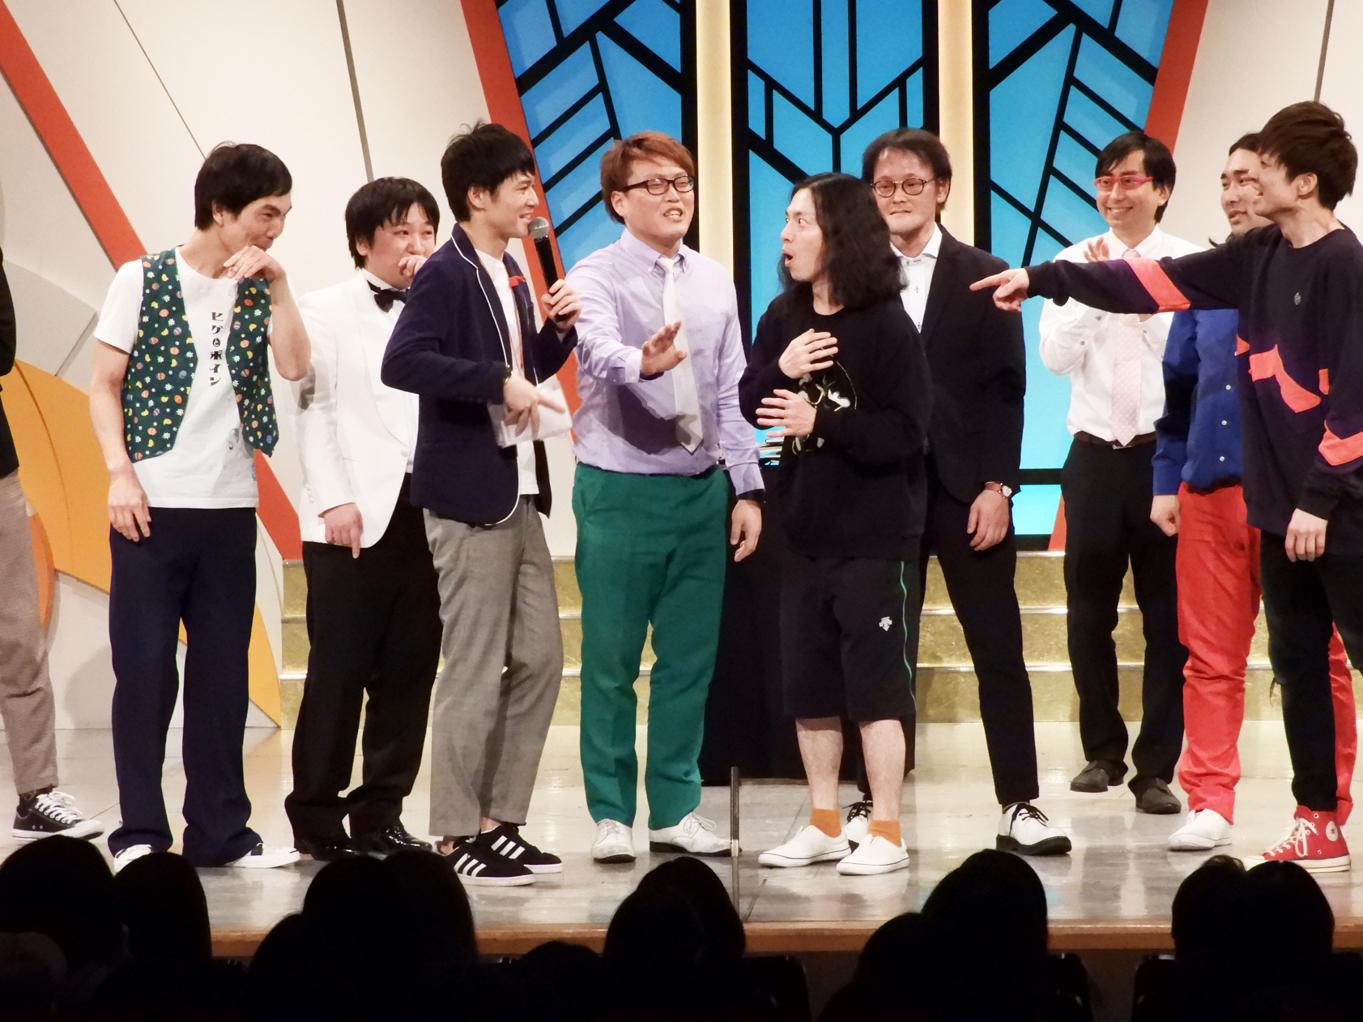 http://news.yoshimoto.co.jp/20180208181933-9be14daea56988d89aec3b53d9e7b3a1995218b7.jpg